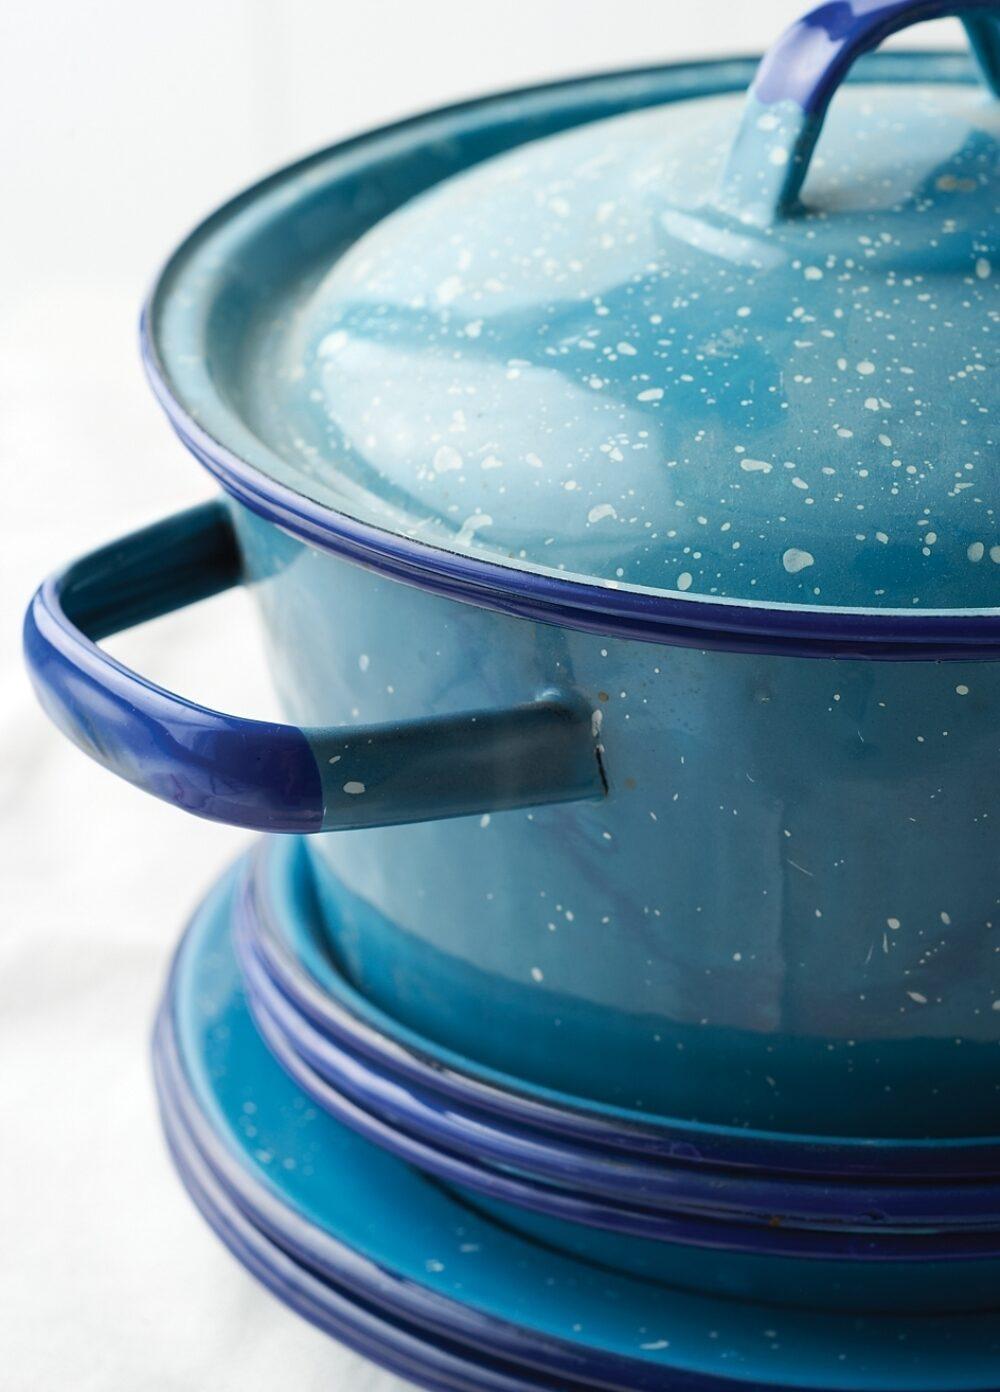 A blue enamelware pot